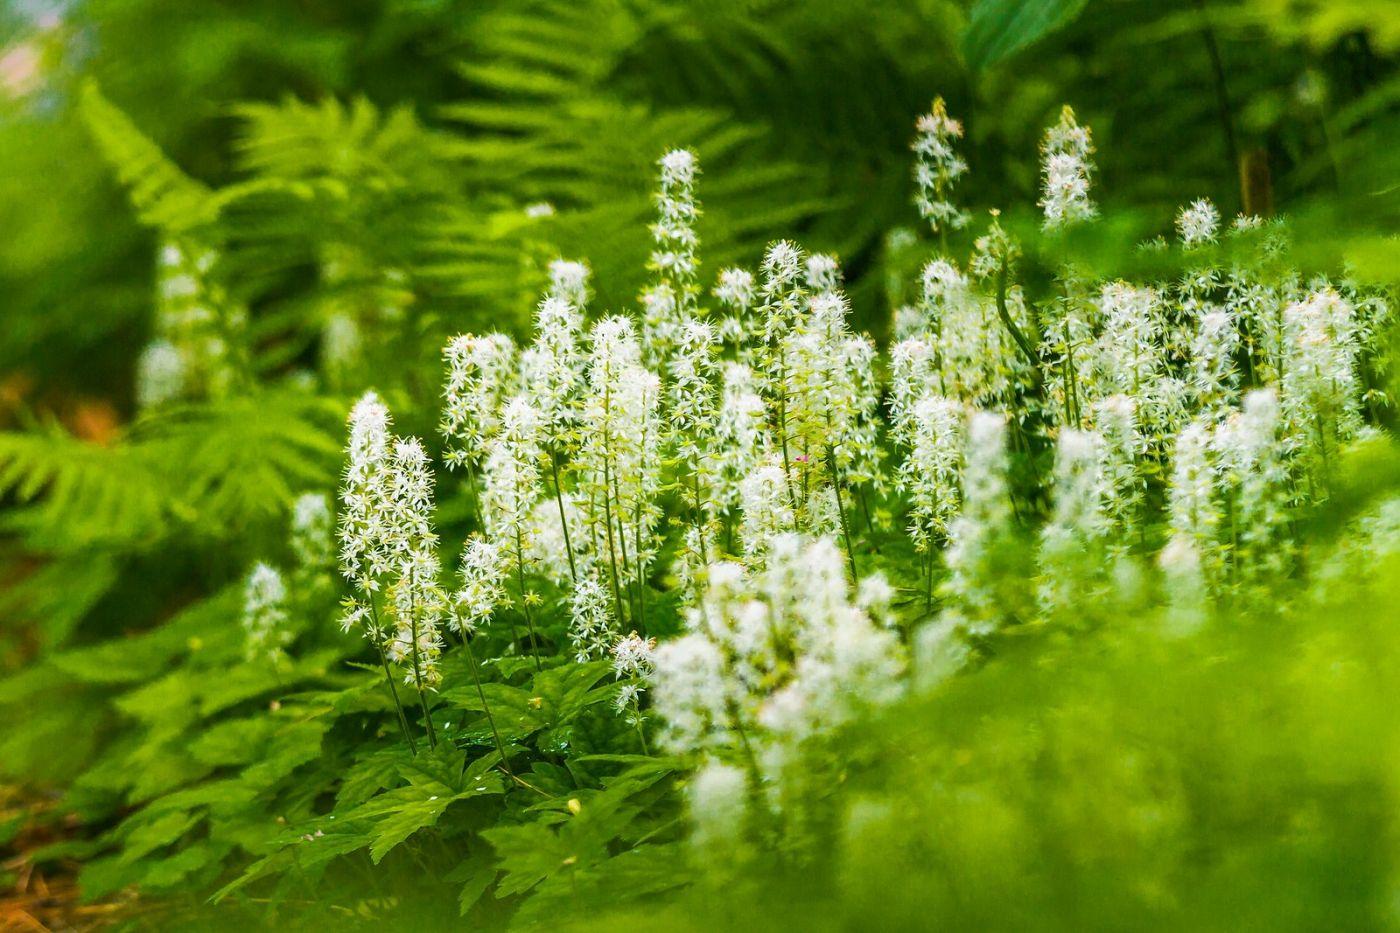 Chanticleer花园,有梦想的季节_图1-28